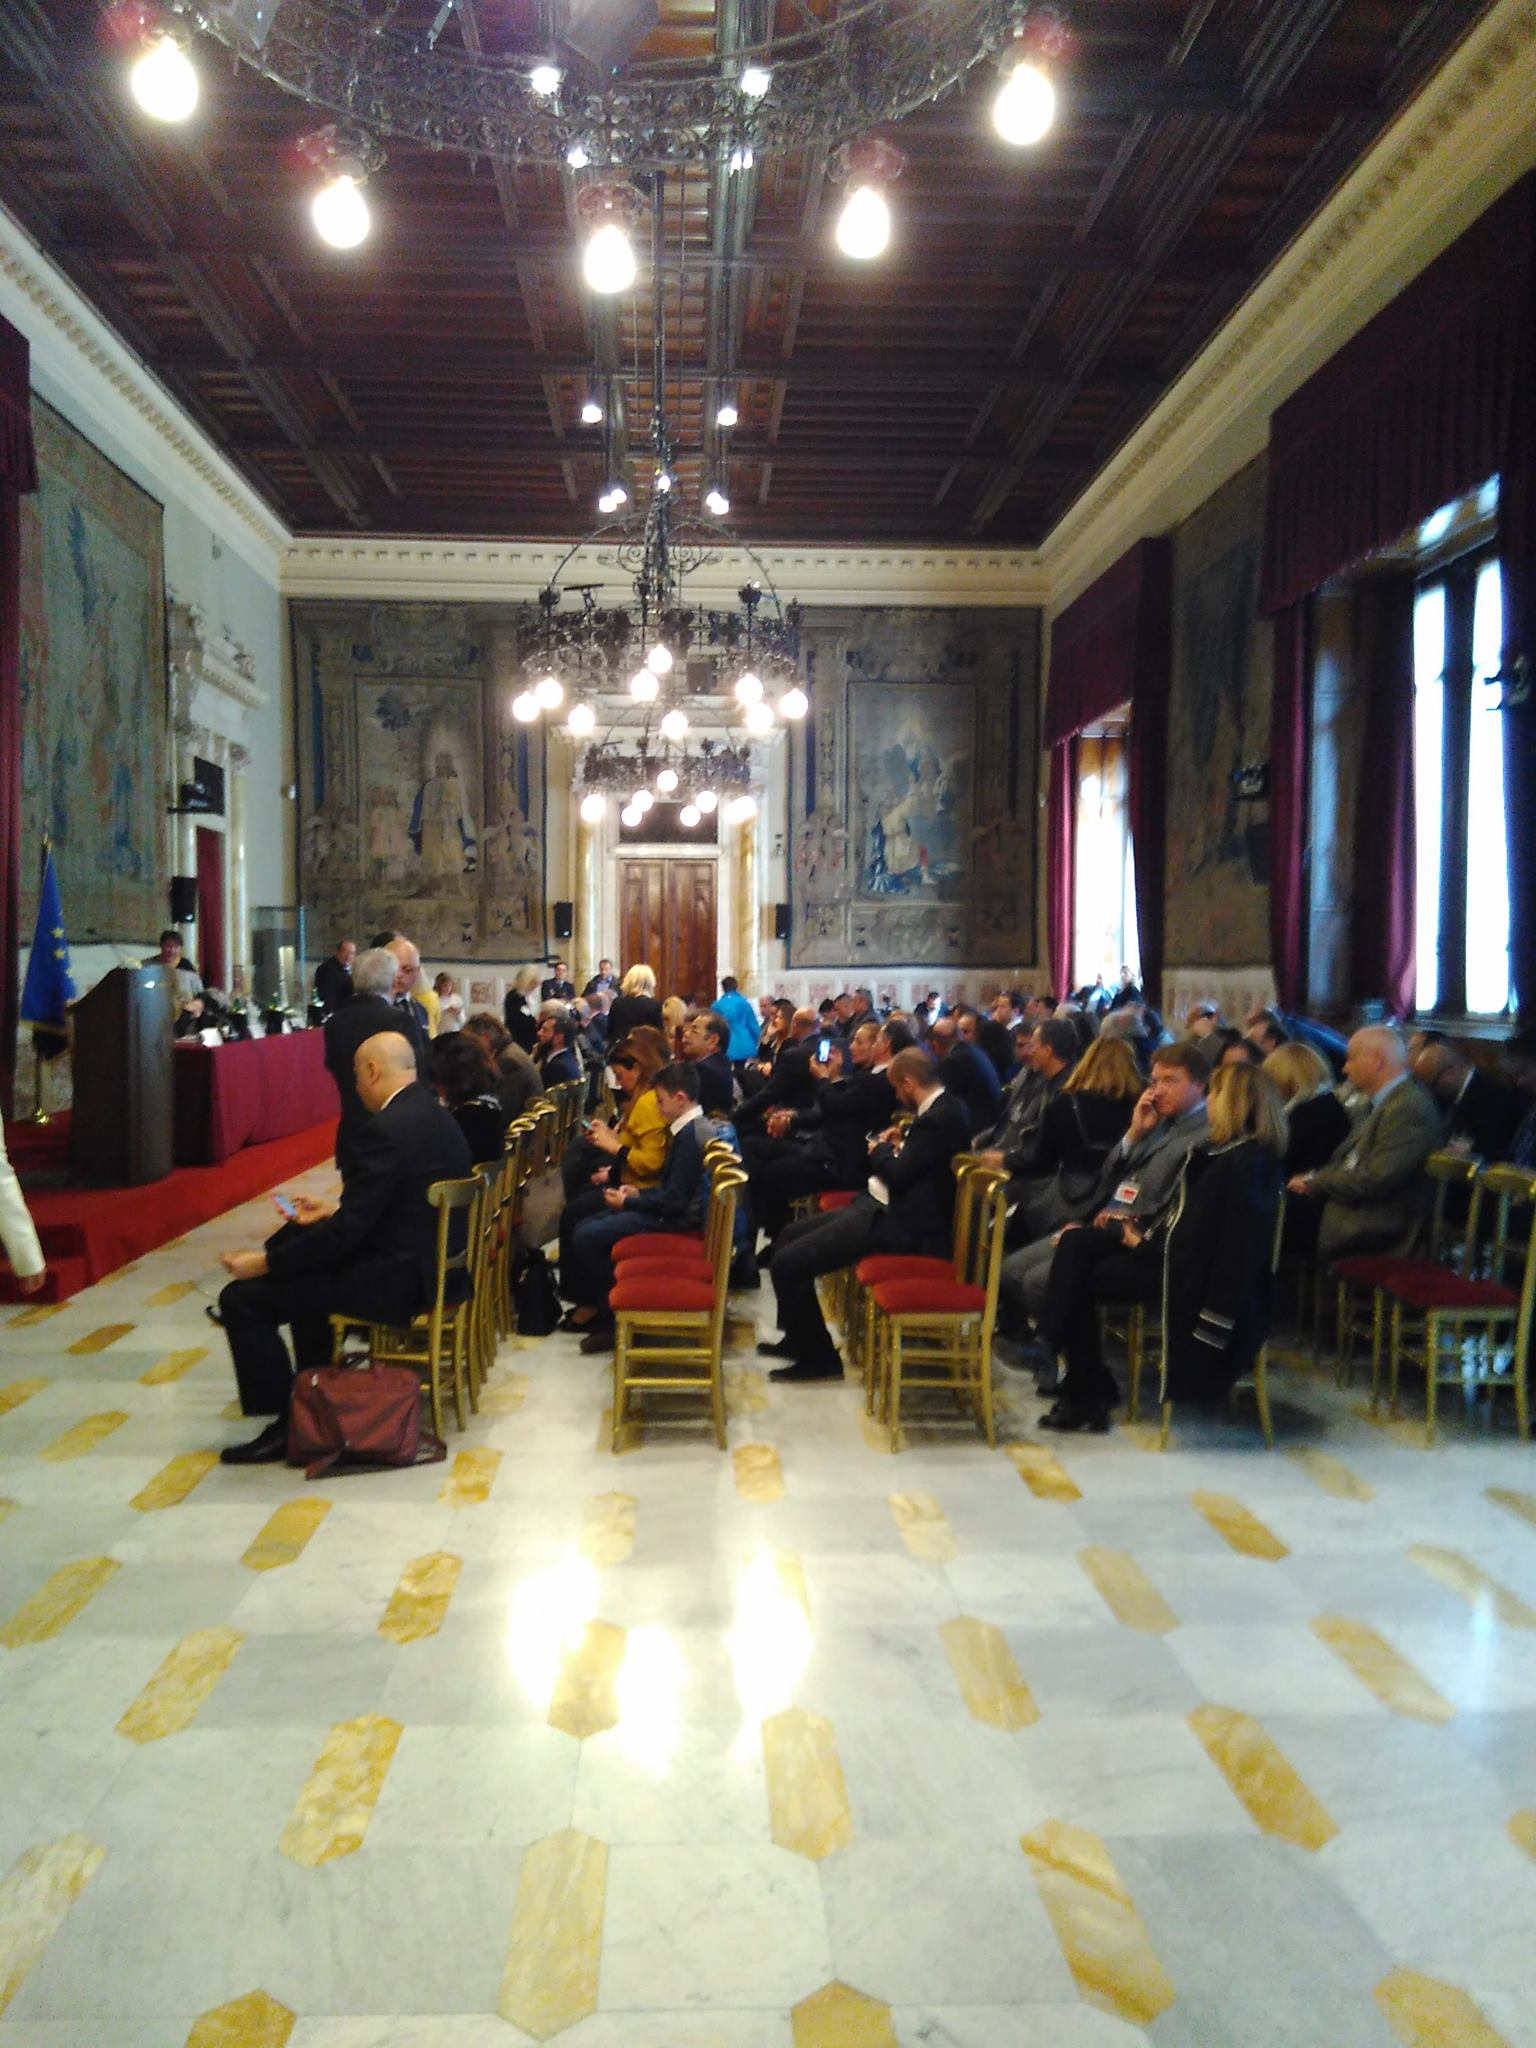 29 marzo 2016 sala regina della camera dei deputati in for Rassegna stampa camera deputati